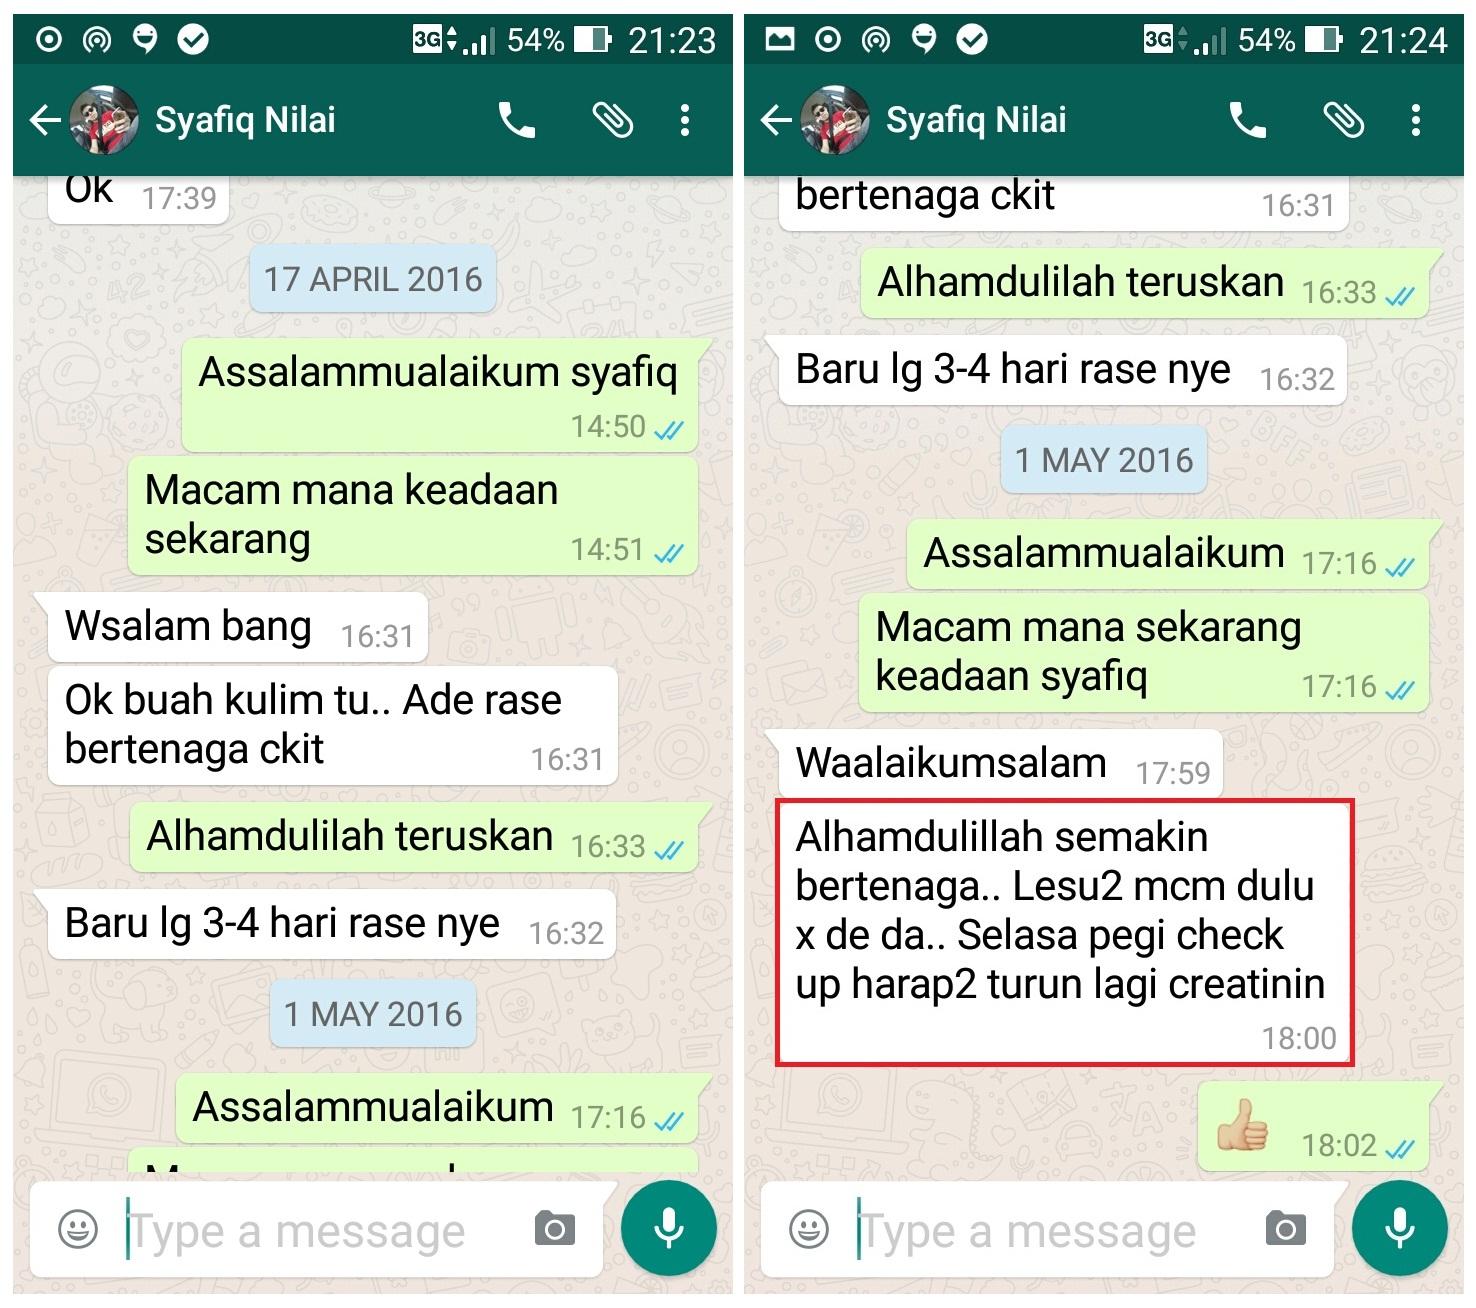 Testimoni Terkini 1.5.2016. Adik Syafiq dari Nilai.